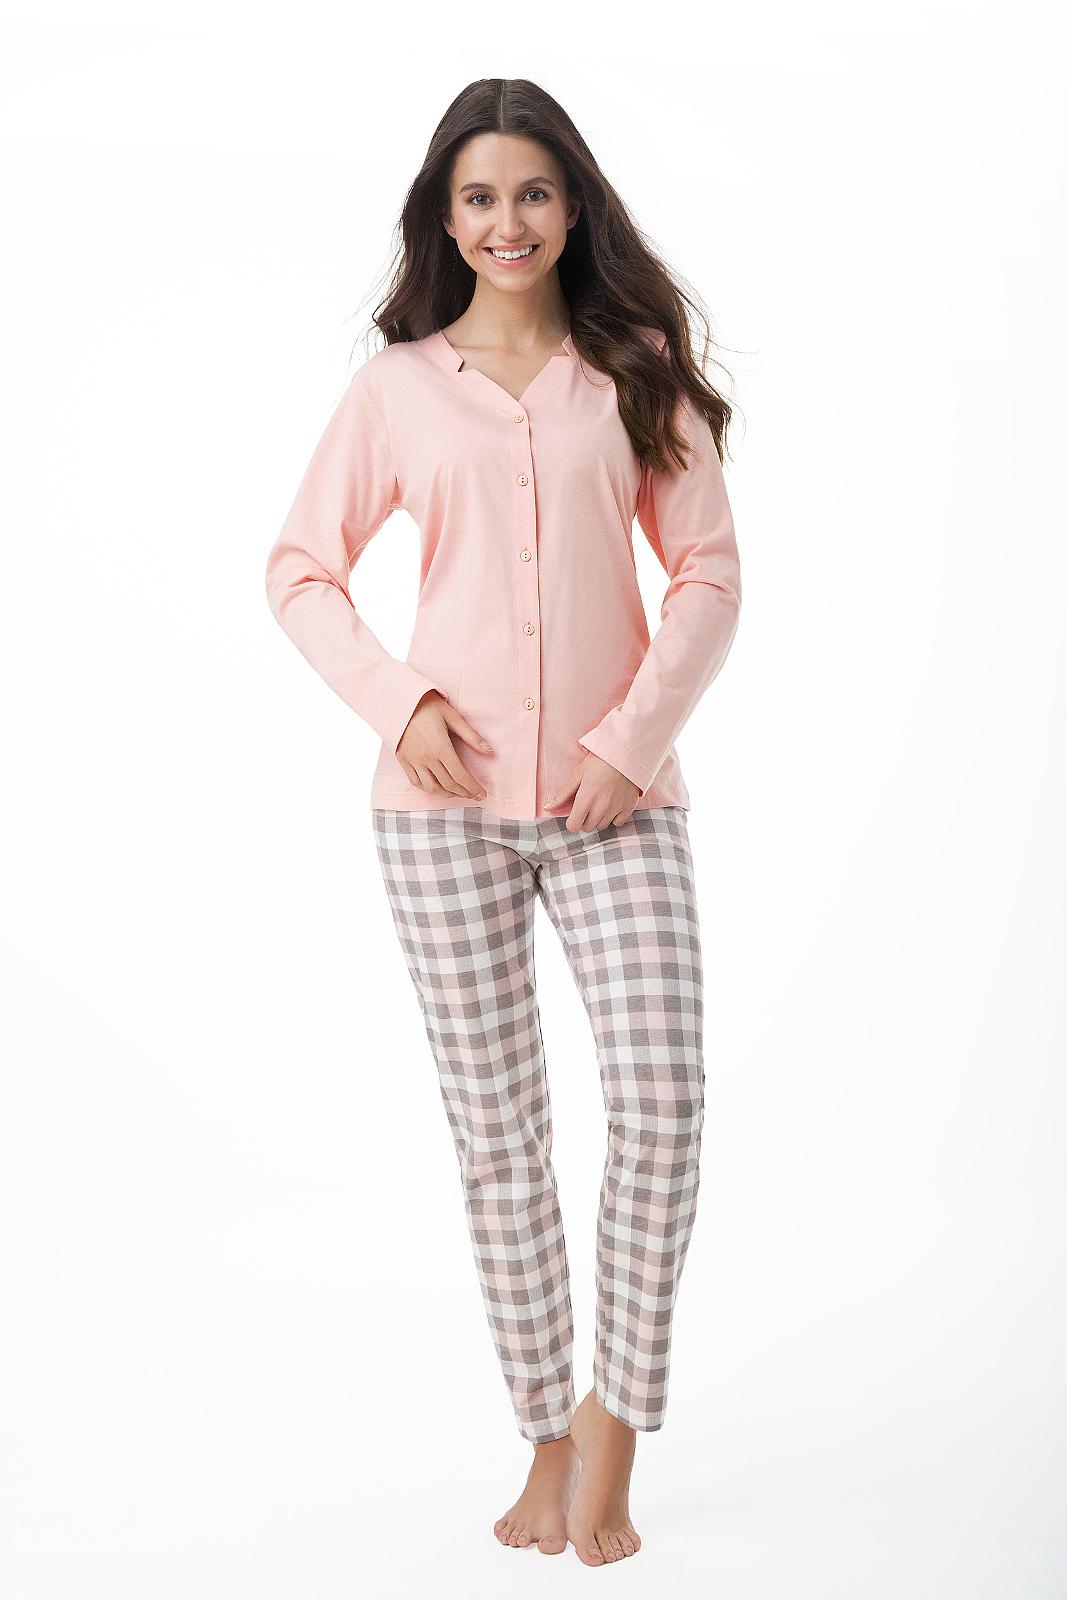 Dámské pyžamo Luna 409 M-2XL dl/r